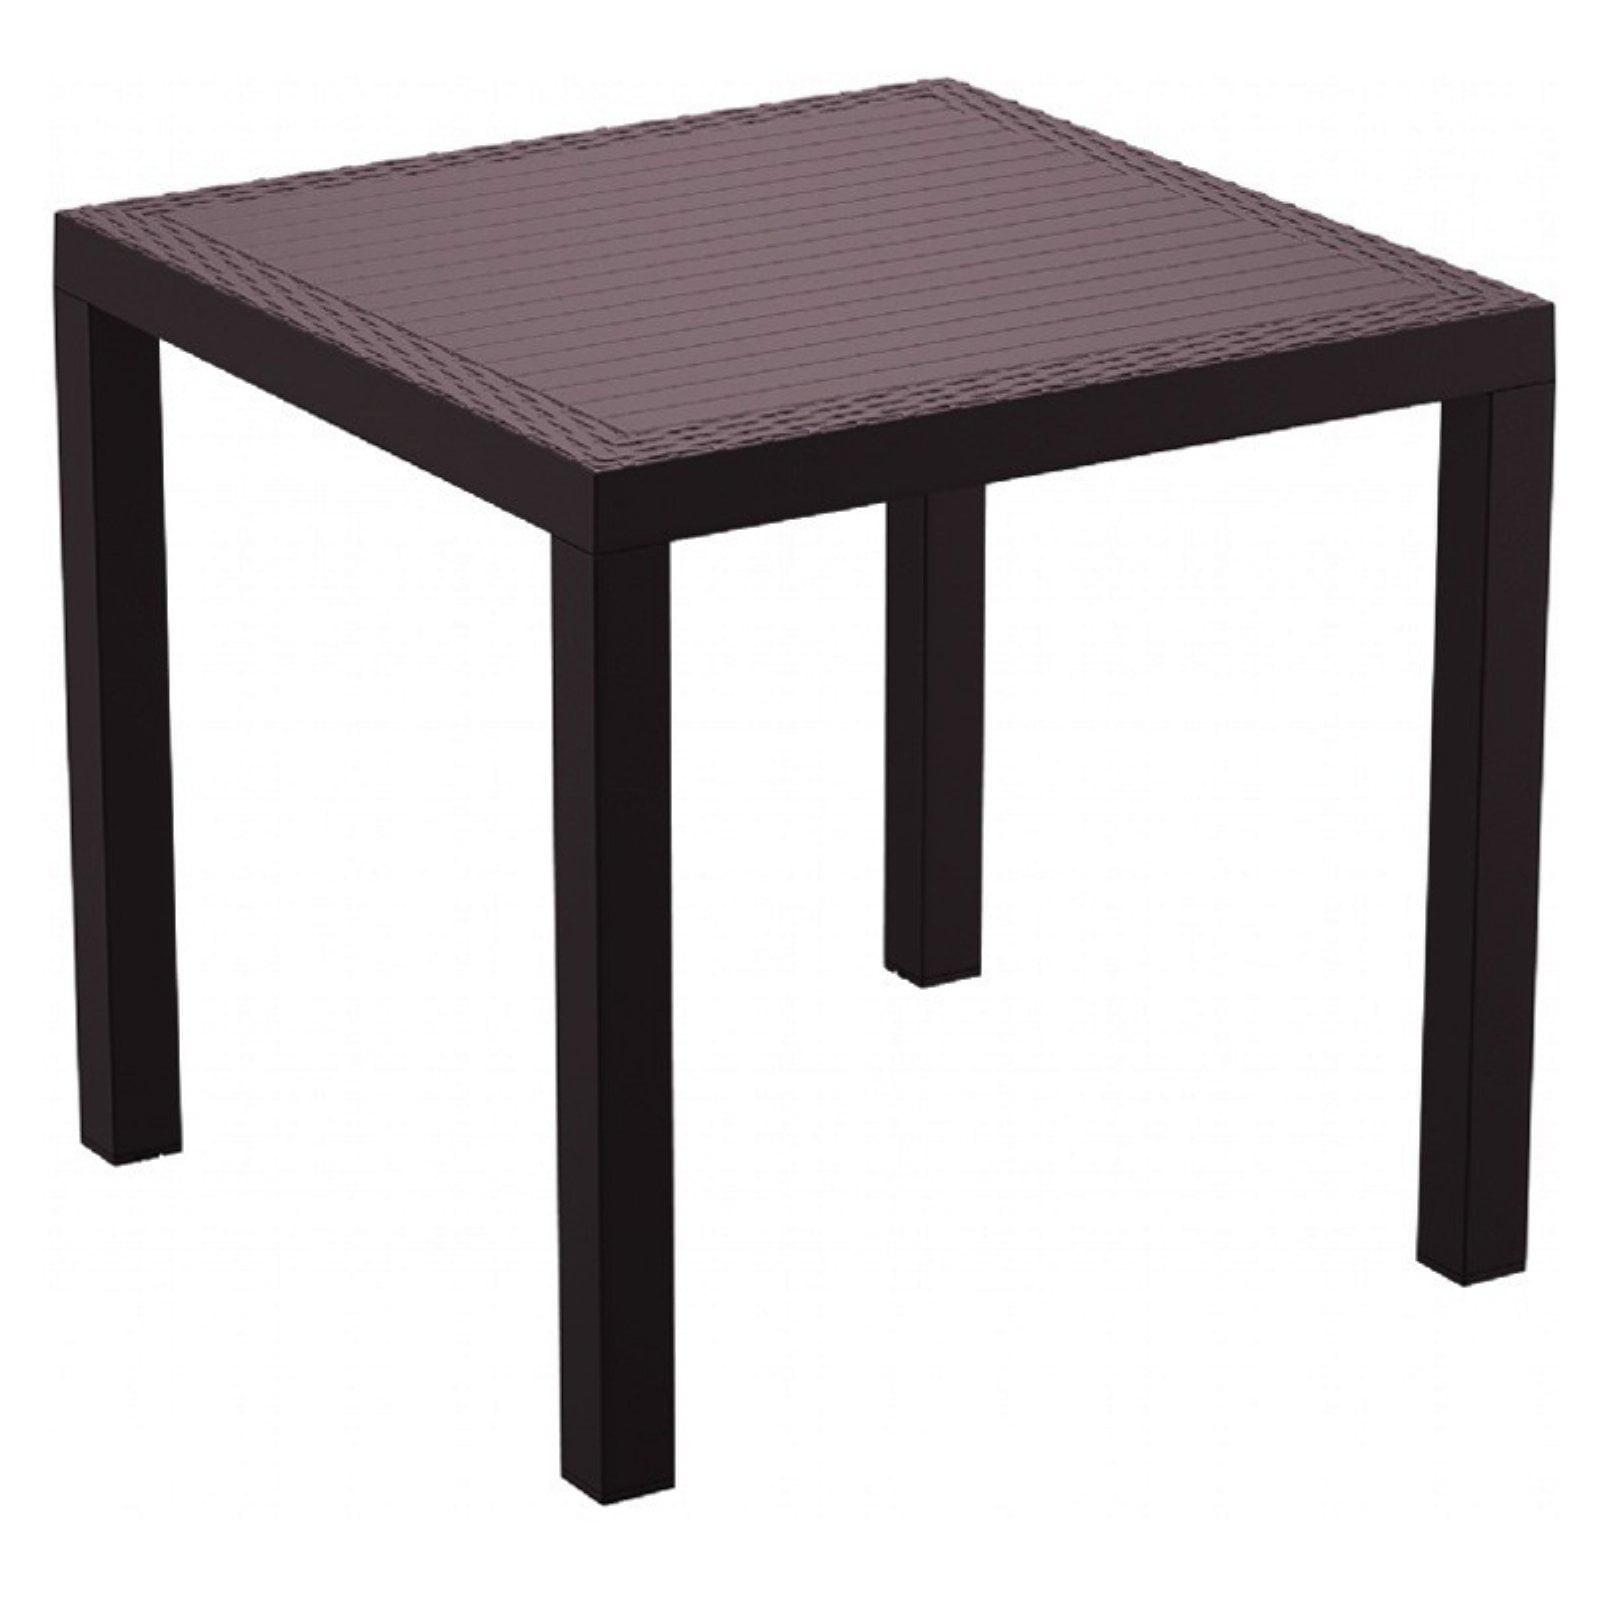 Compamia Orlando Resin Wicker Square Patio Dining Table by Compamia